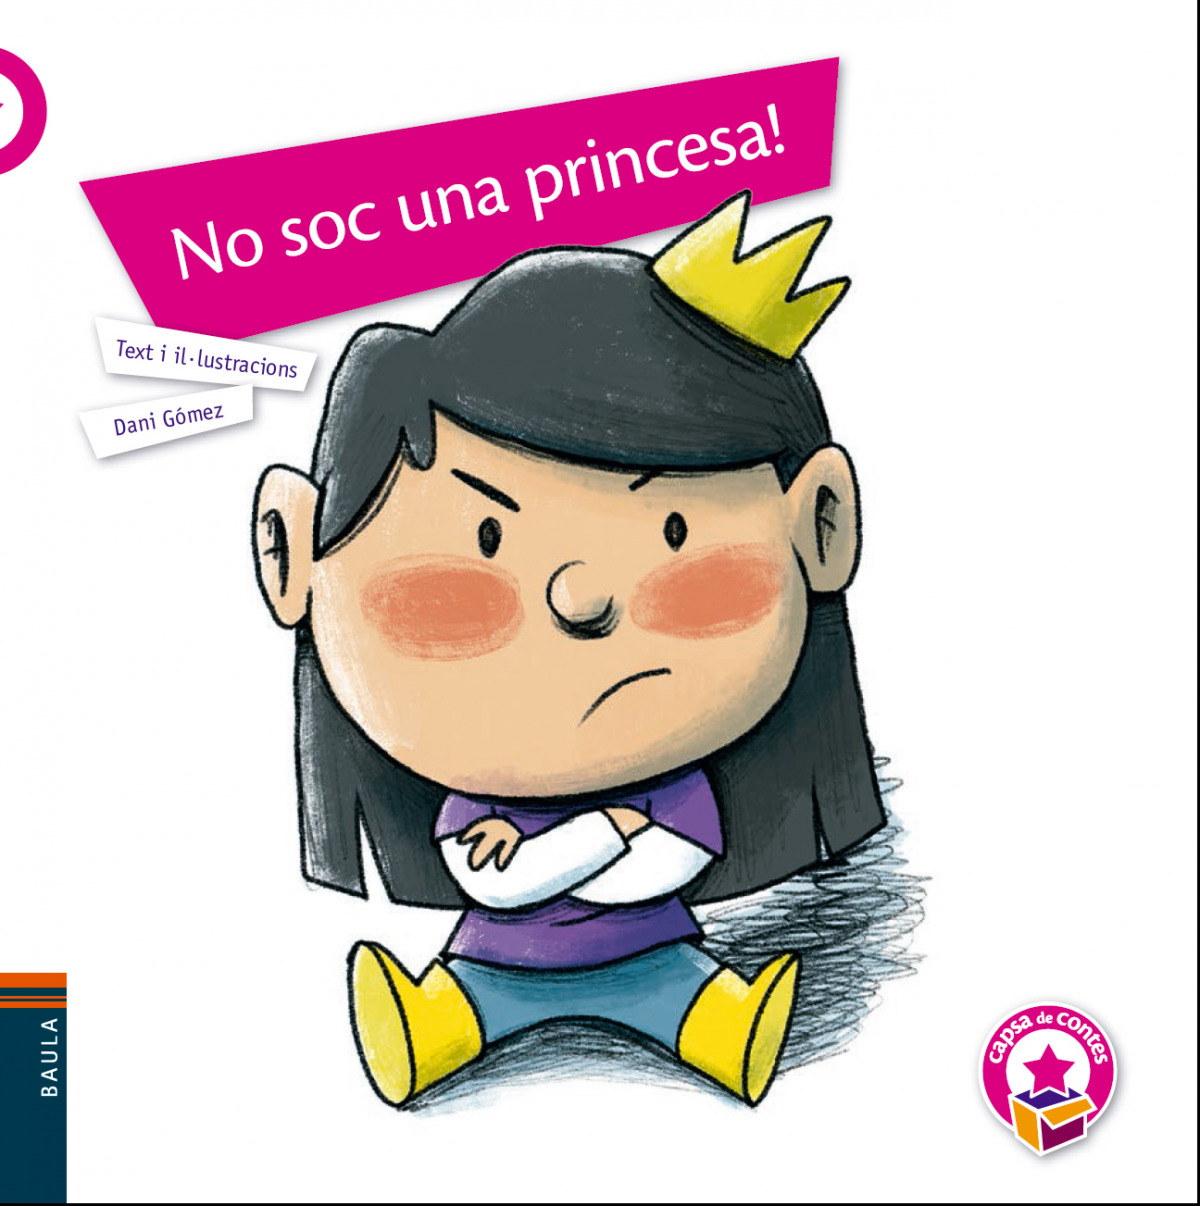 No soc una princesa!